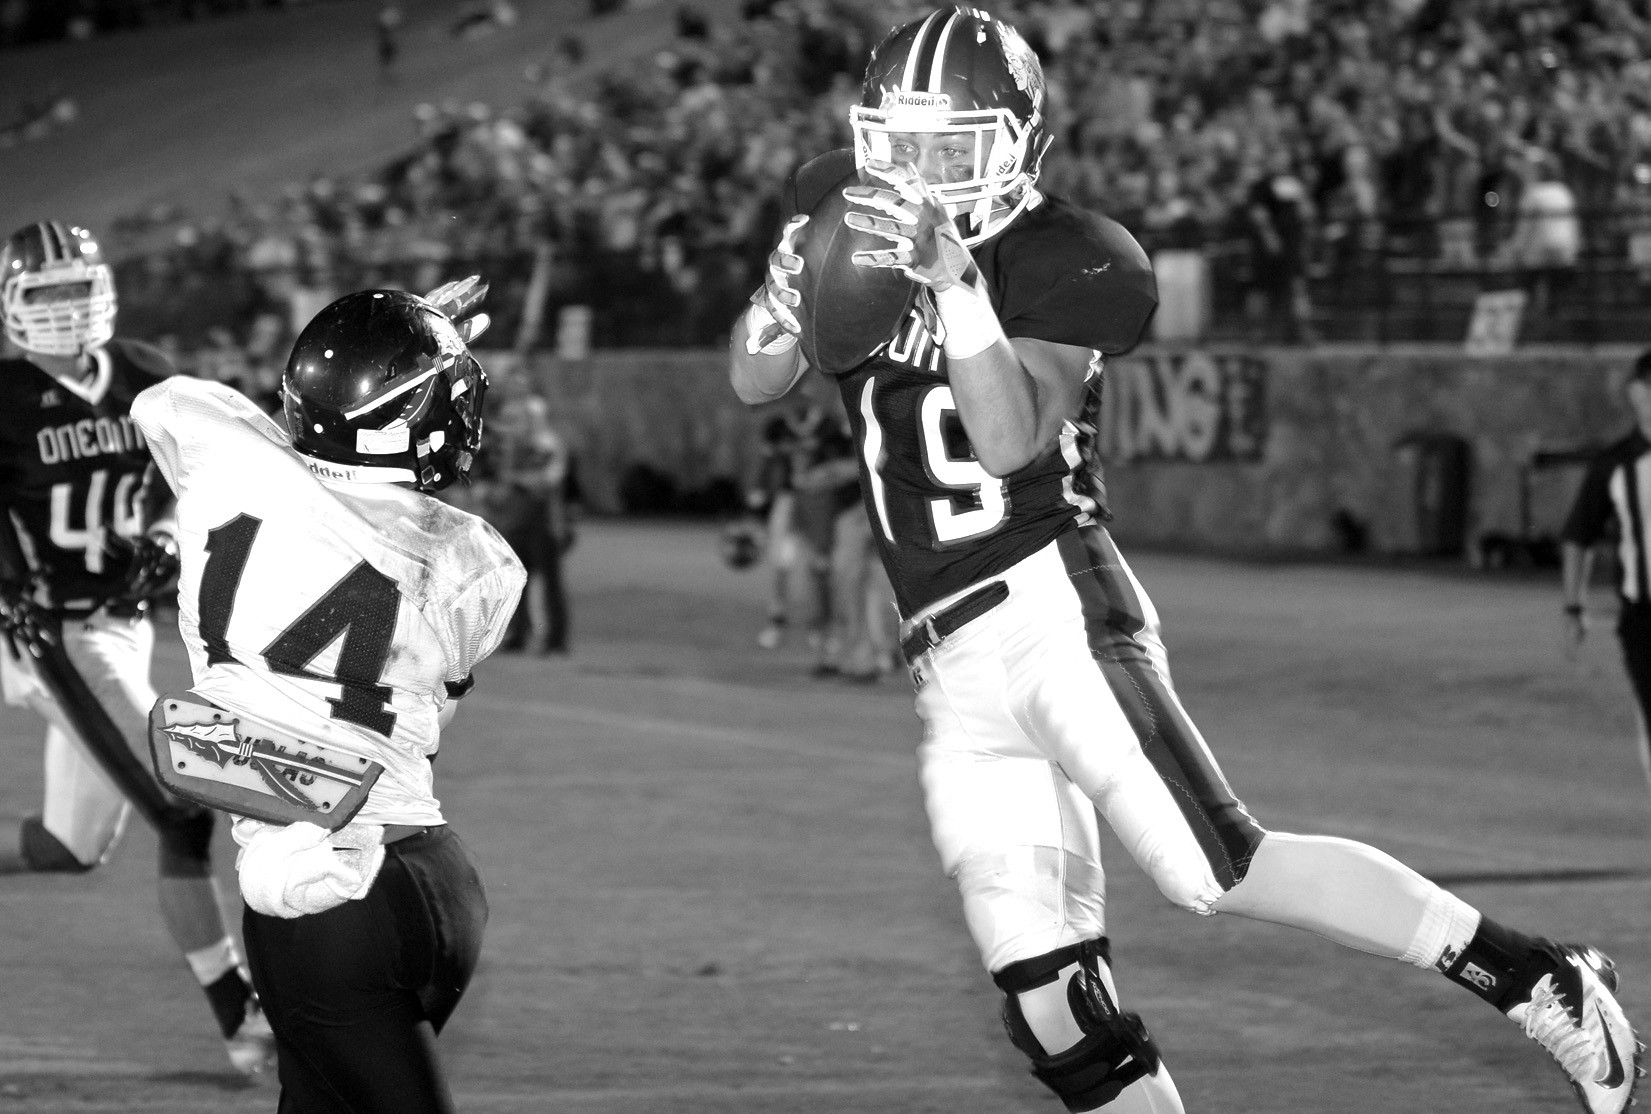 Trevor Smith hauls in a touchdown pass.